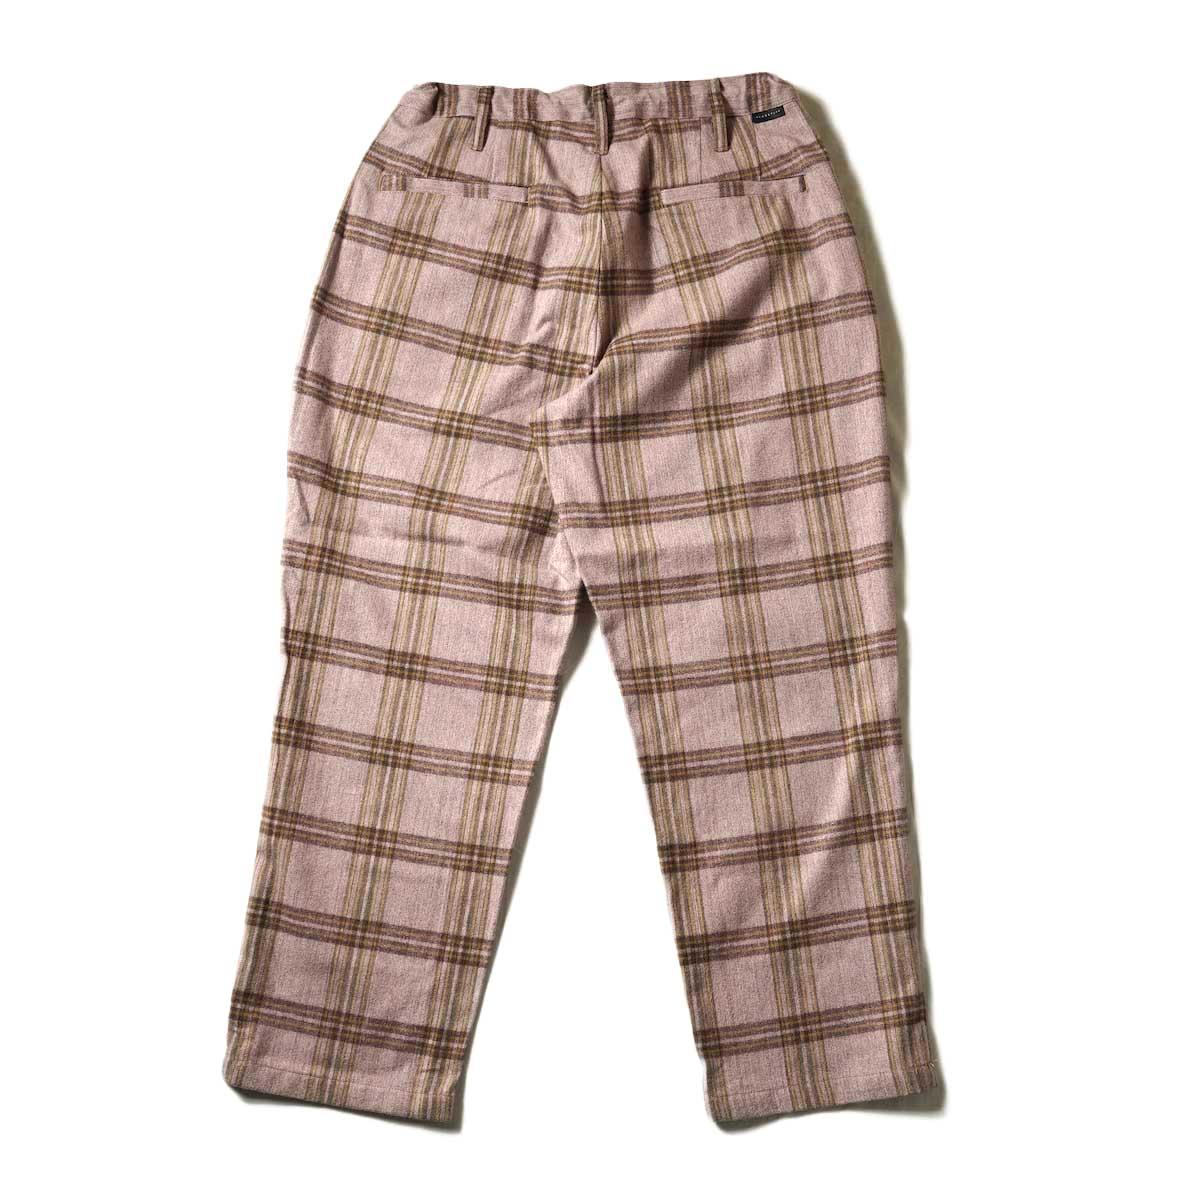 F-LAGSTUF-F / FORWARD PLEATS PANTS (ORIGINAL CHECK / PURPLE)背面